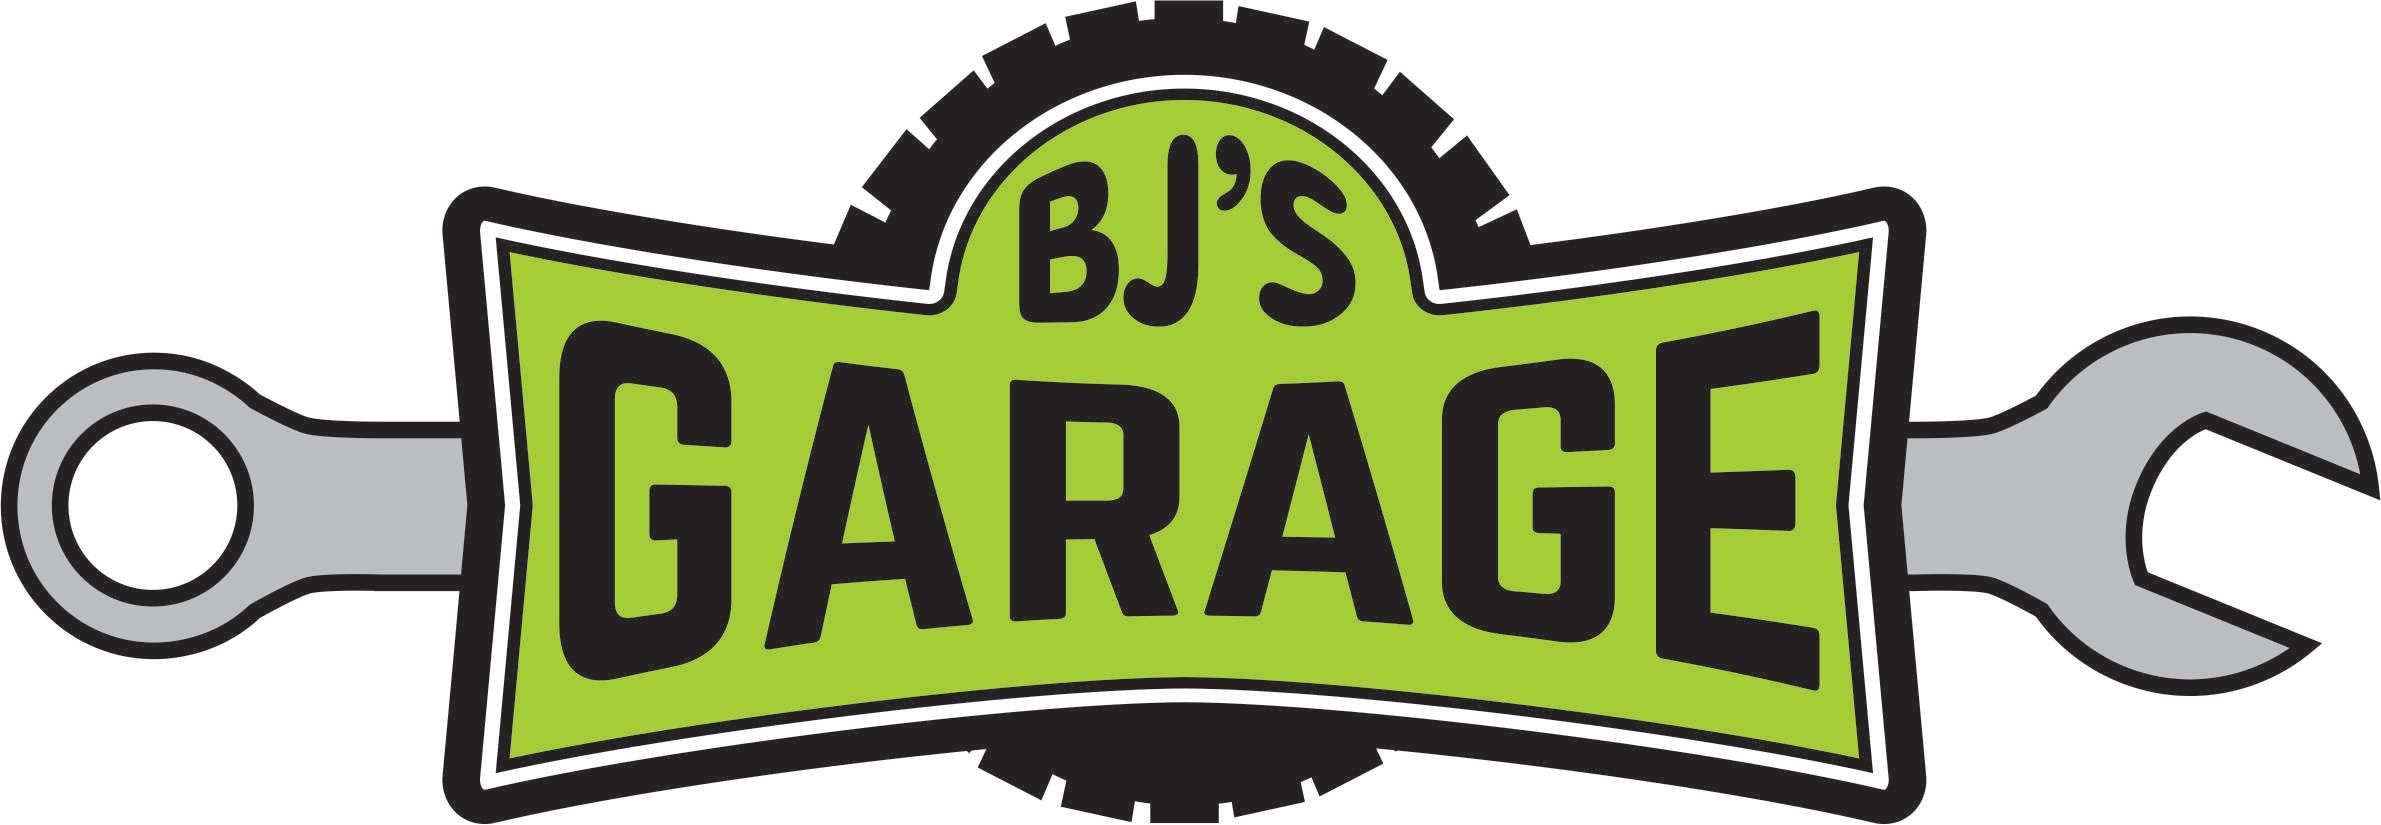 BJSgarage2016